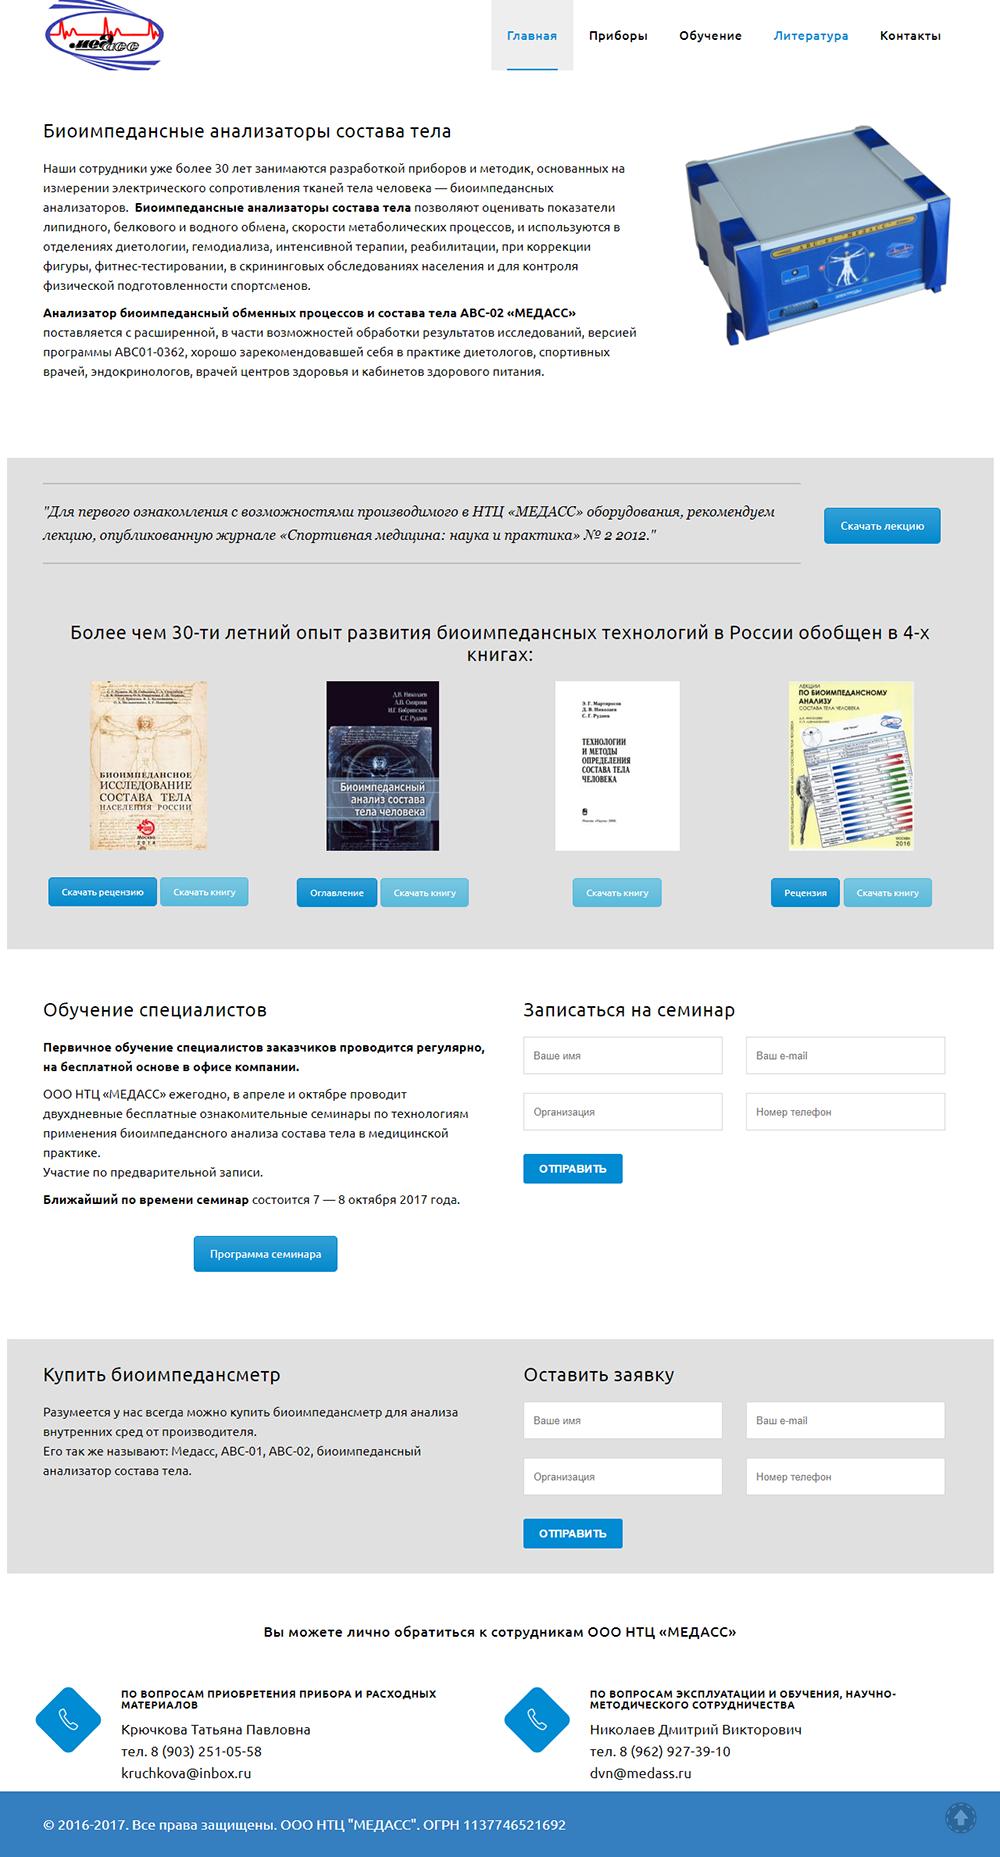 Главная страница сайта научно-технического центра